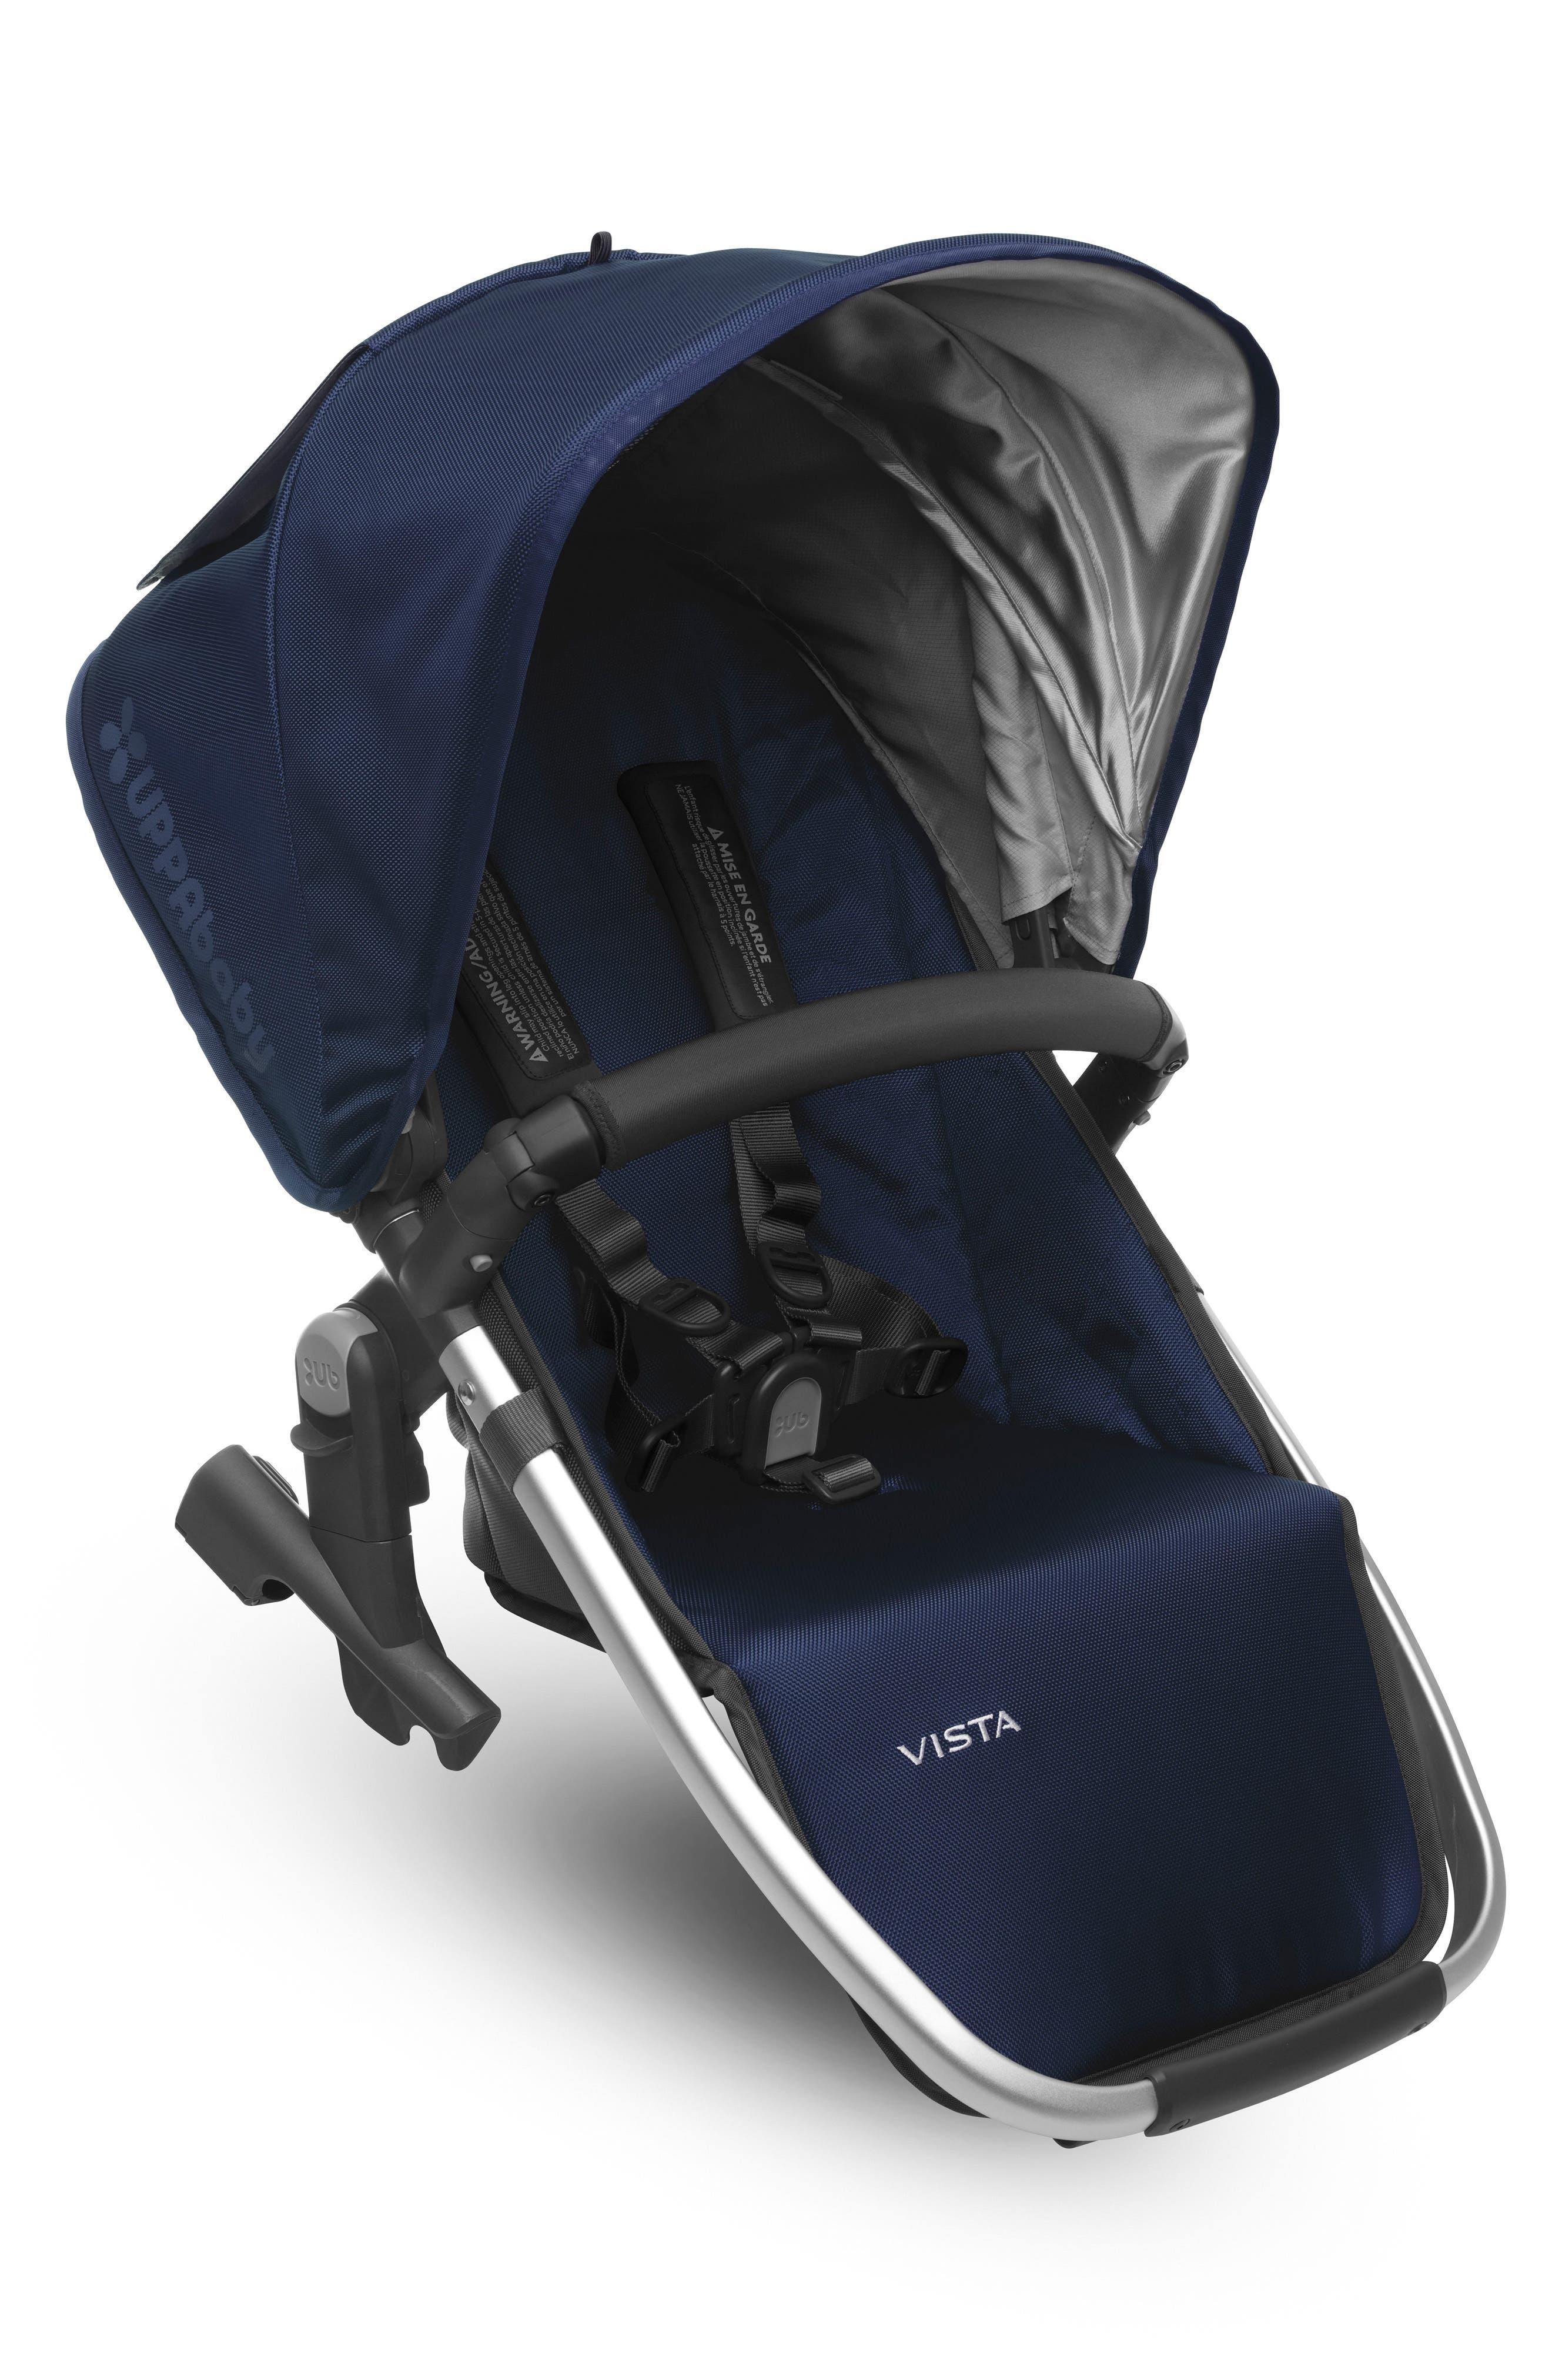 VISTA Stroller Rumble Seat,                         Main,                         color, 410